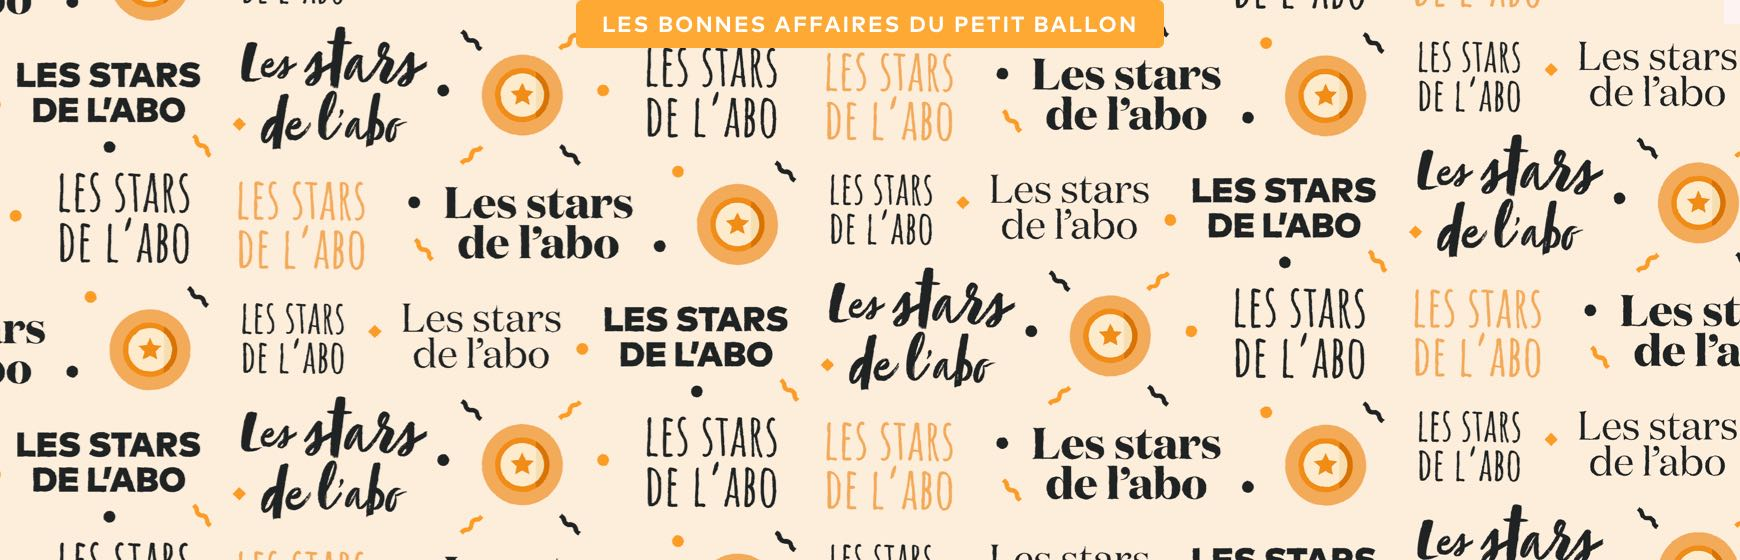 Les stars de l'abo